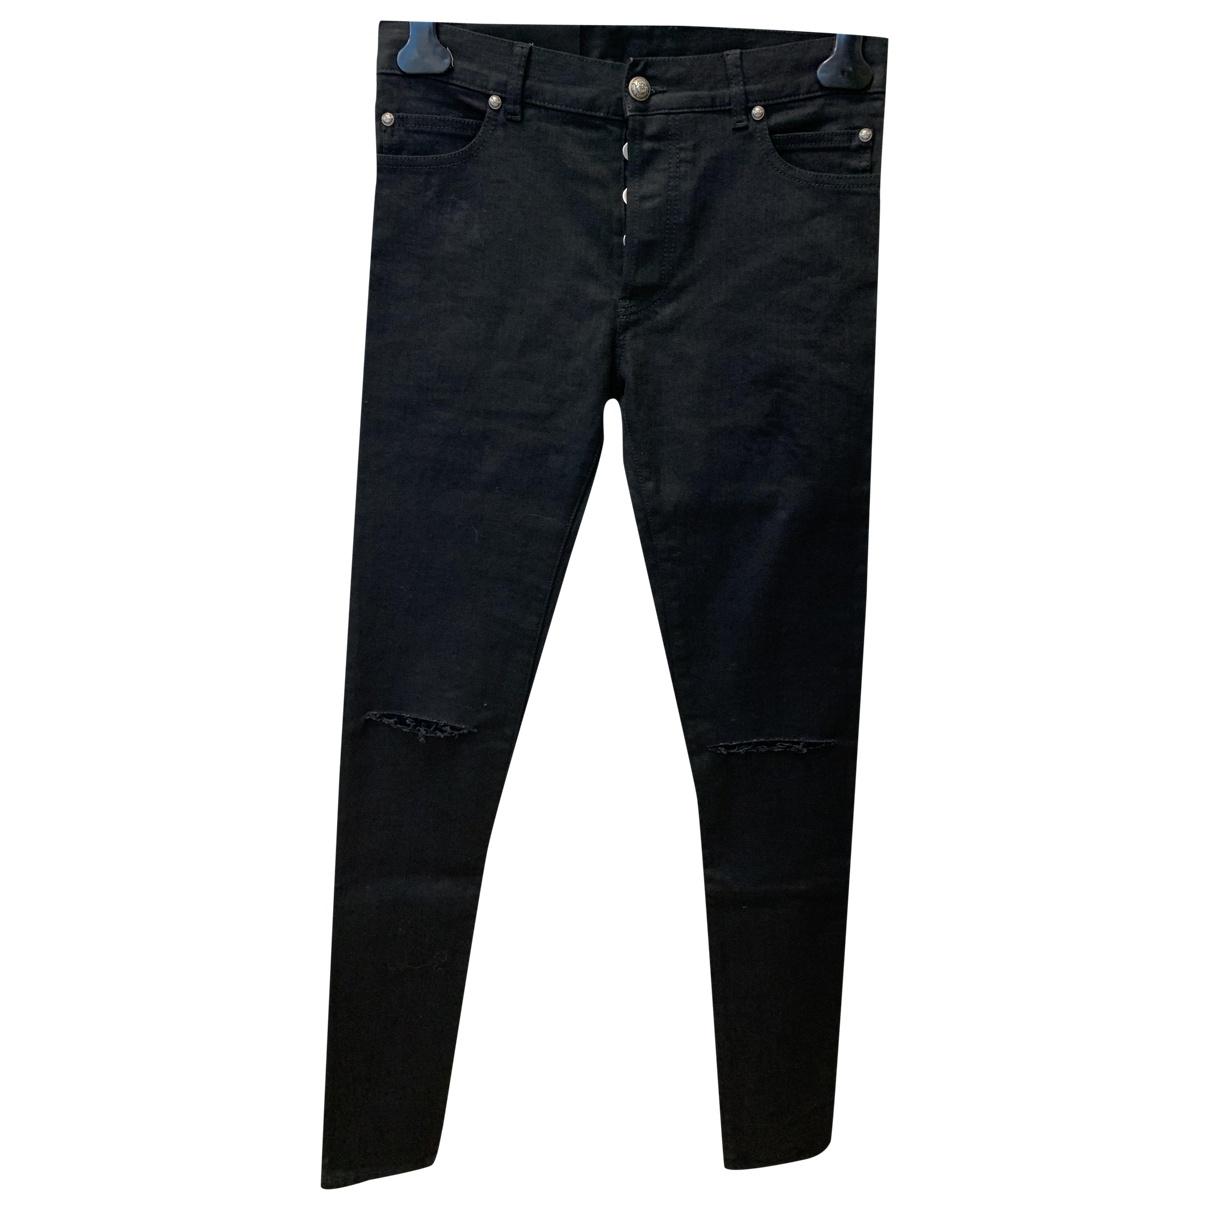 Balmain \N Black Cotton Jeans for Men 32 US